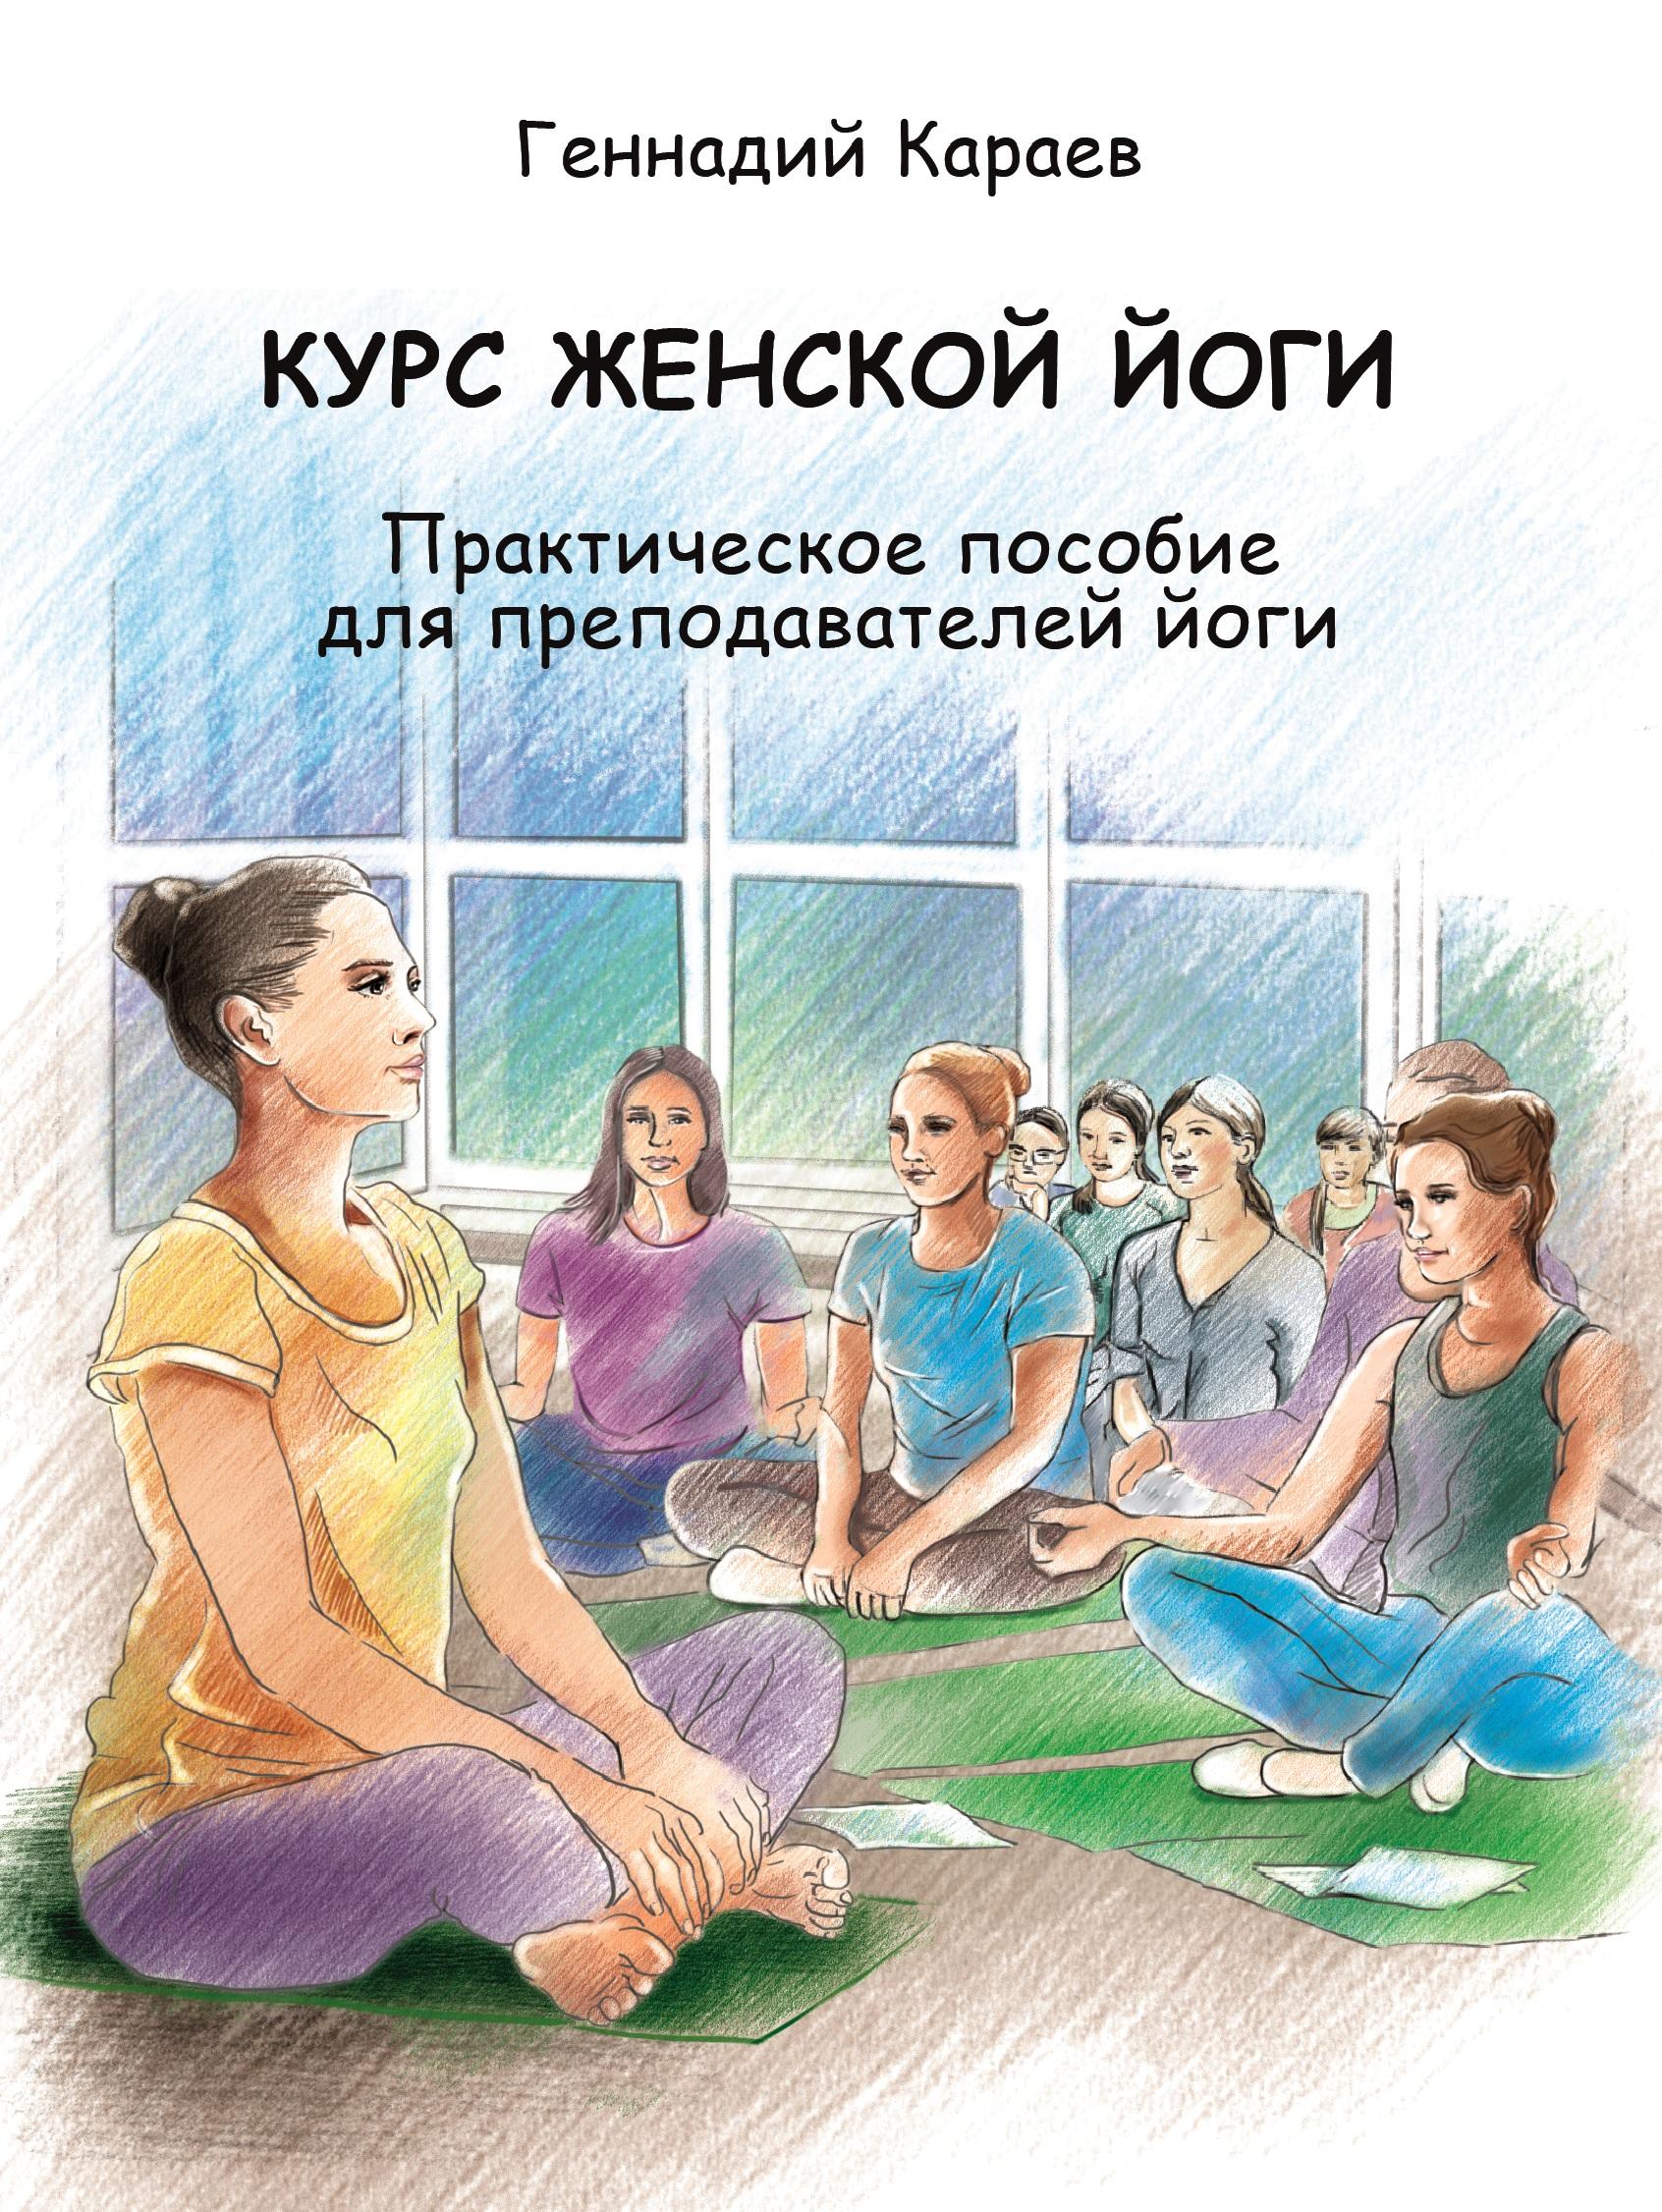 Обложка с названием книги